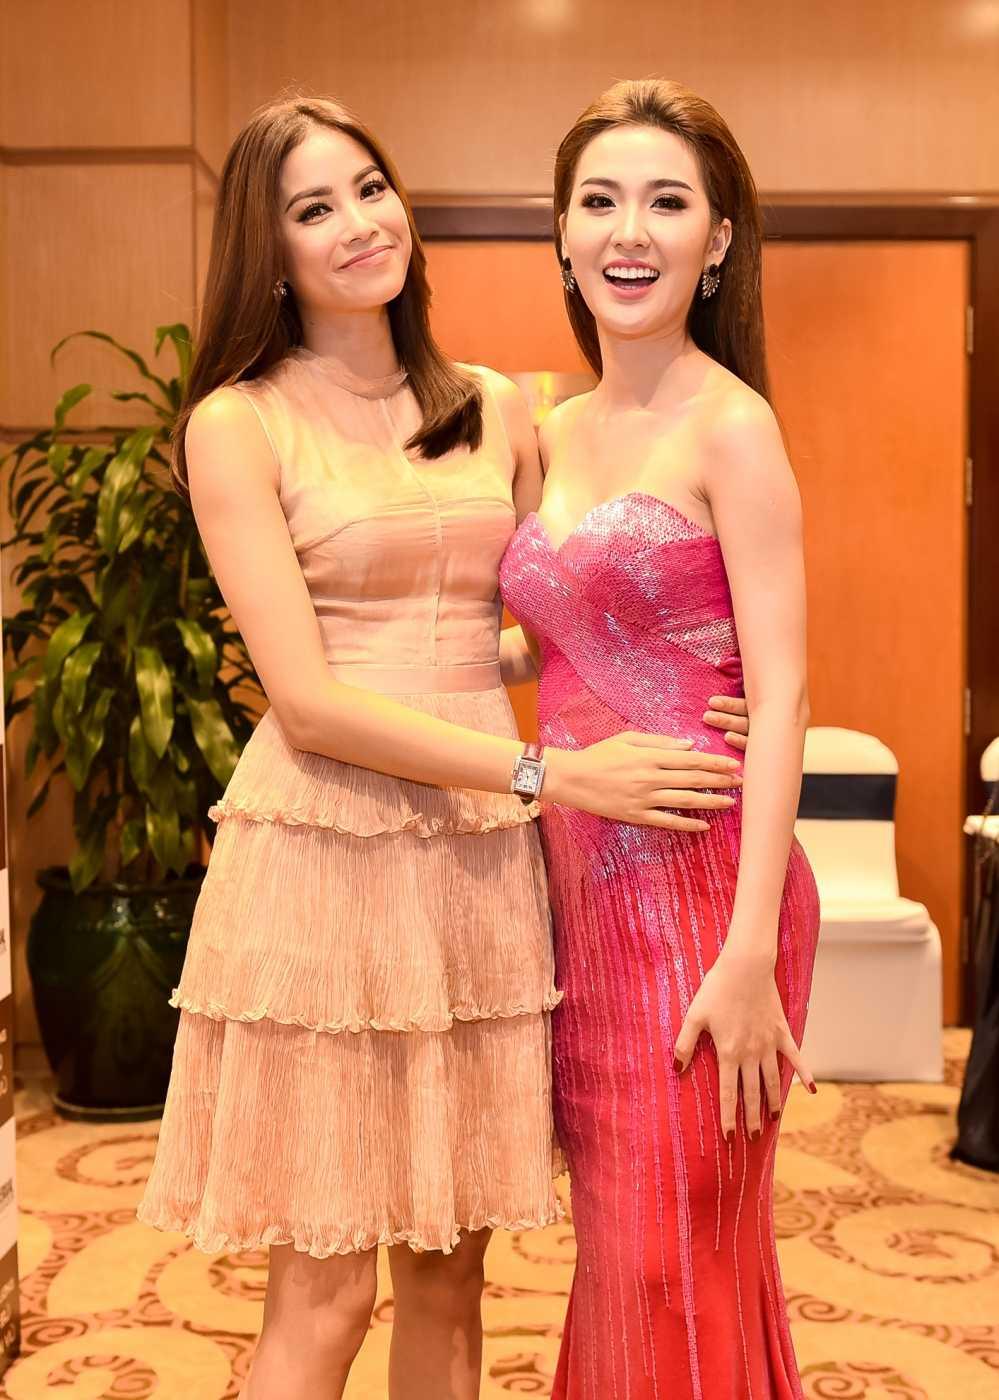 So Ngoc Loan ho henh vi qua goi cam, Pham Huong tan tinh chinh vay hinh anh 3